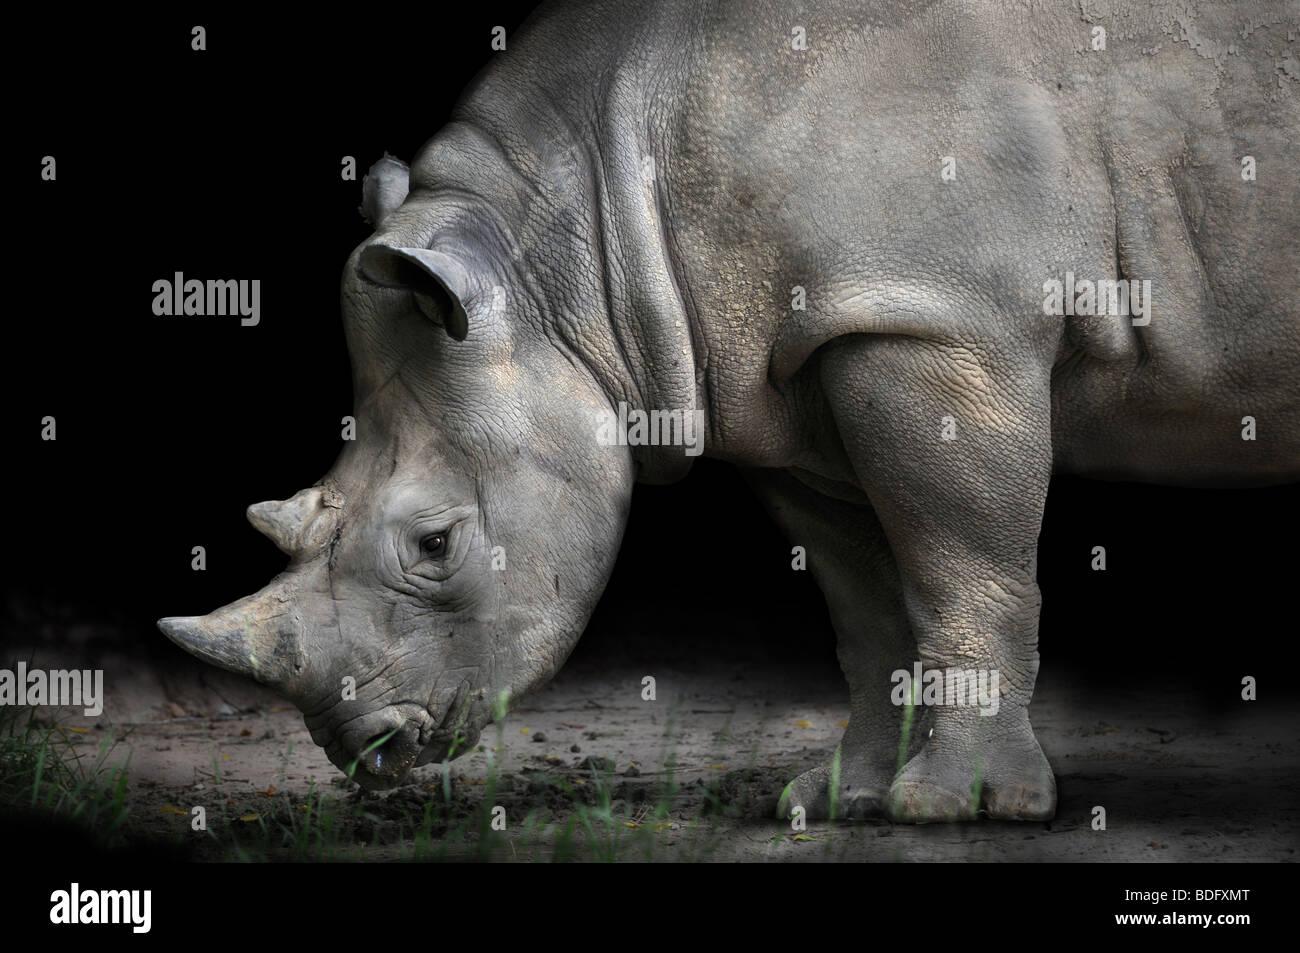 Rhinoceros bending to eat over dark background - Stock Image